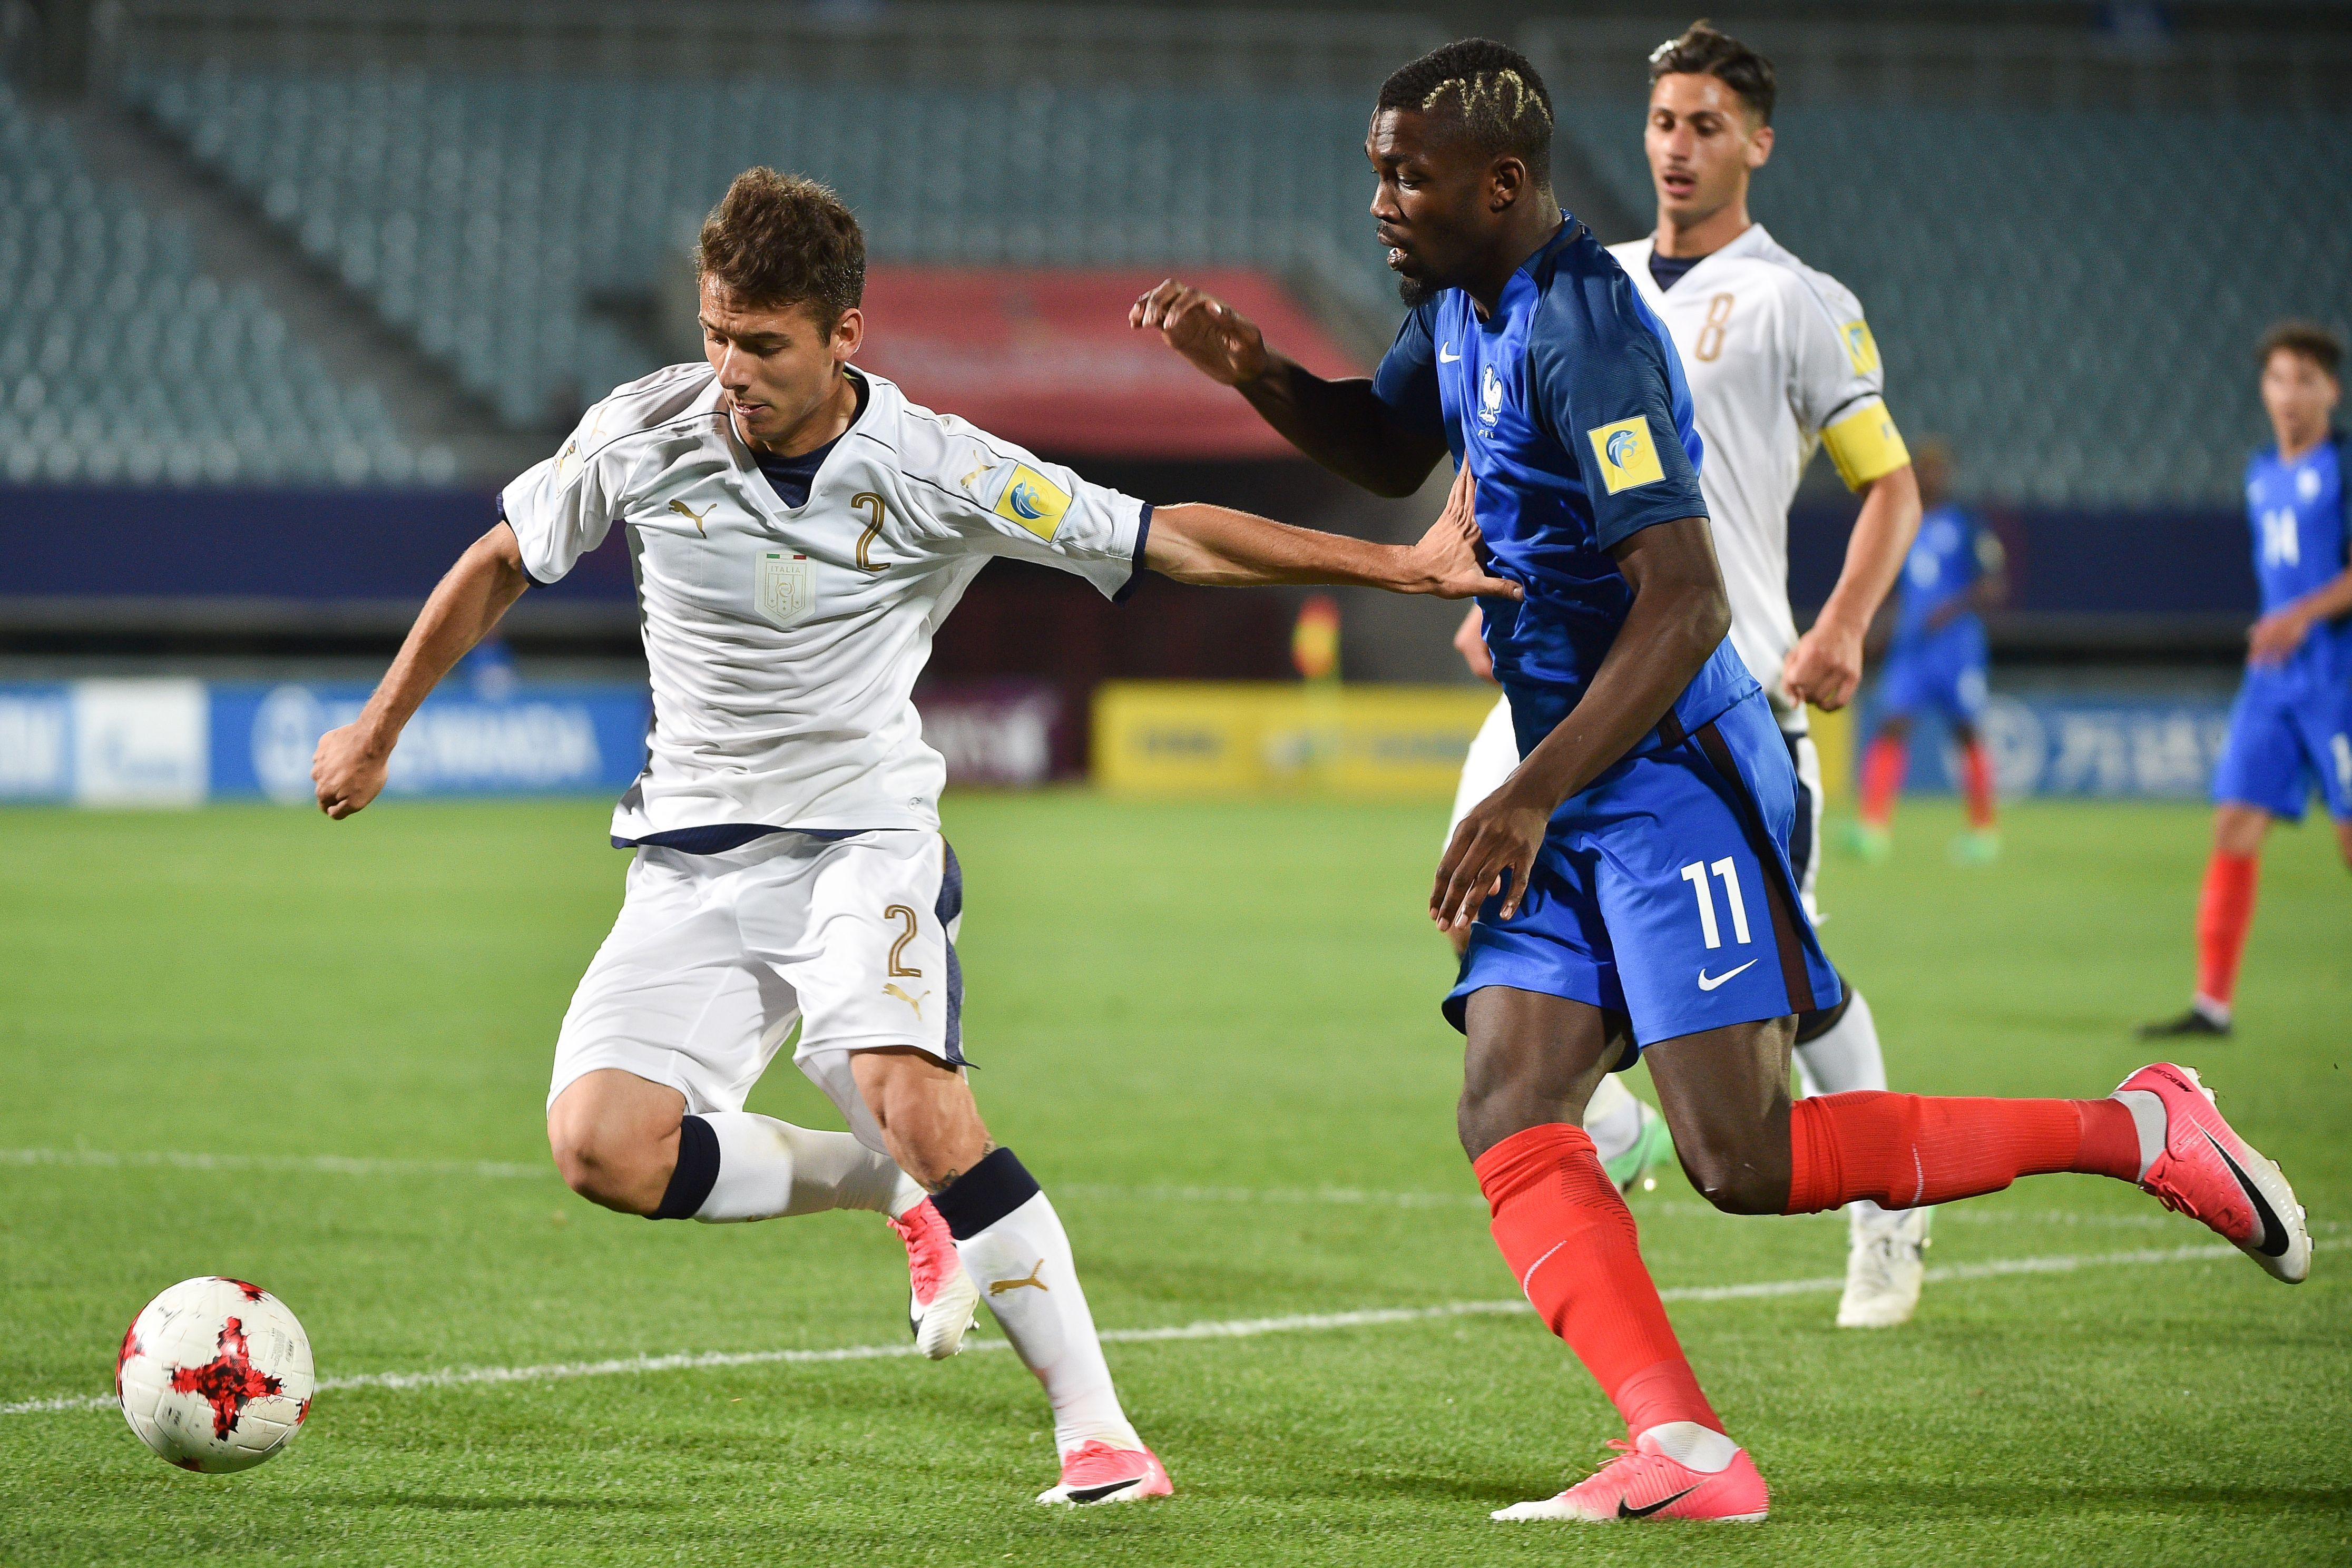 Marcus Thuram Calon Bintang Ligue 1 Prancis Goal Com